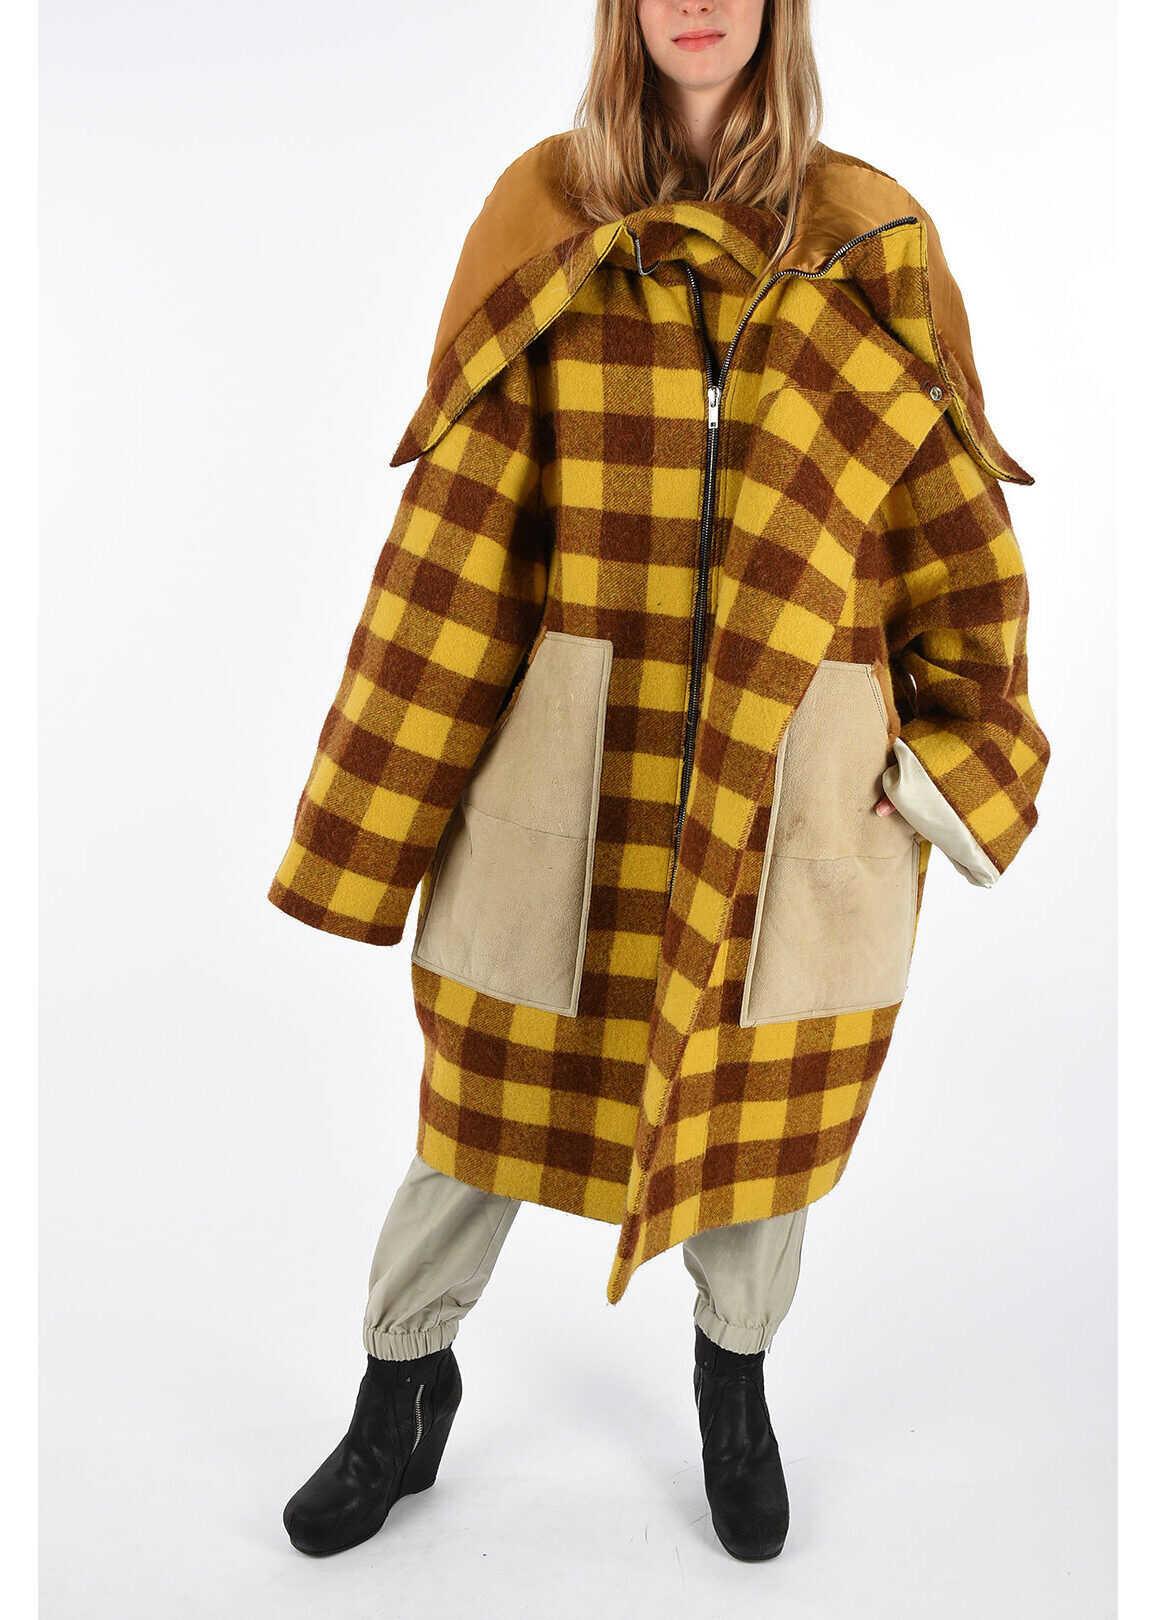 Rick Owens Virgin Wool Blend SECRET Coat RAISIN PLAID YELLOW